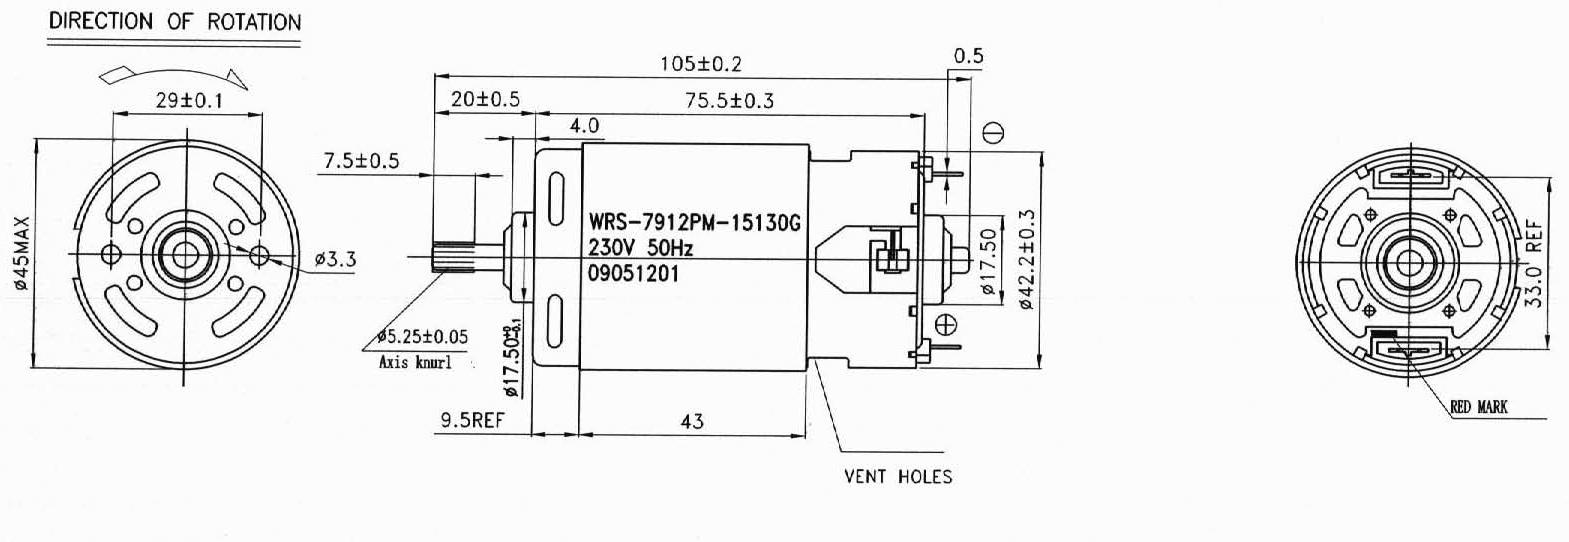 2000 s10 system waring diagrams